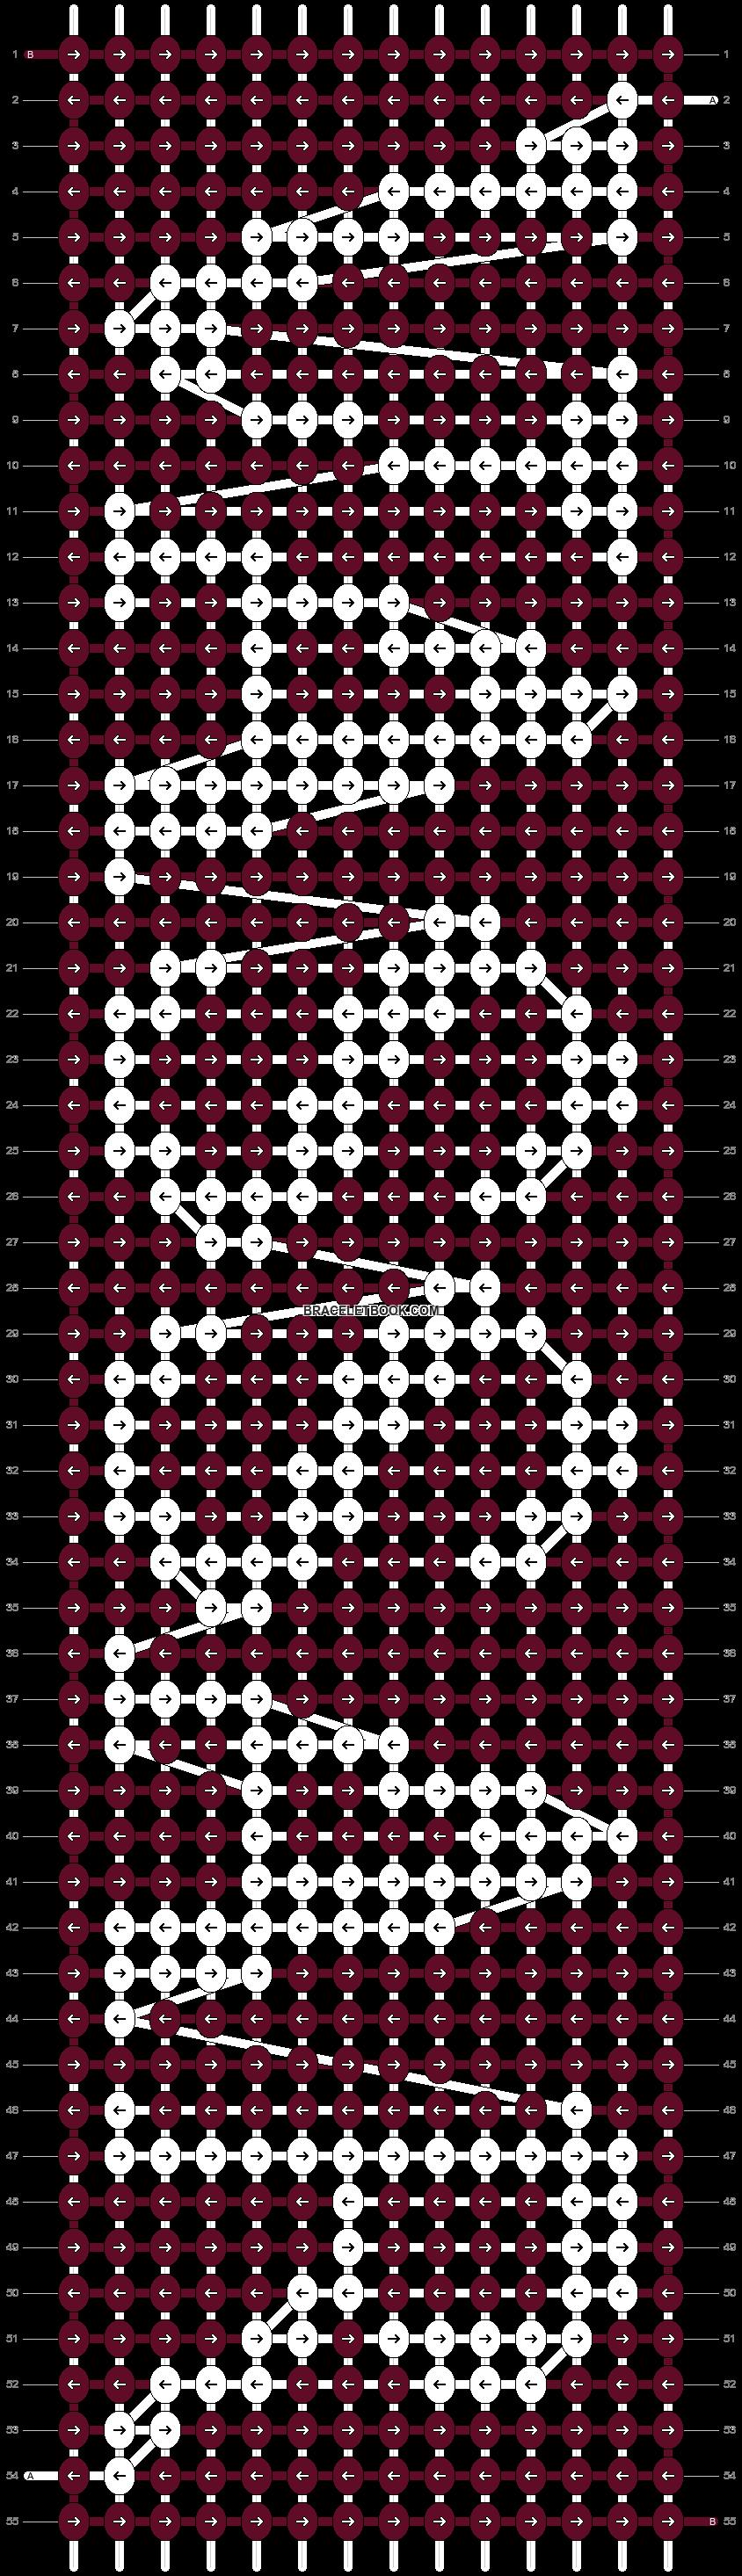 Alpha pattern #67728 pattern